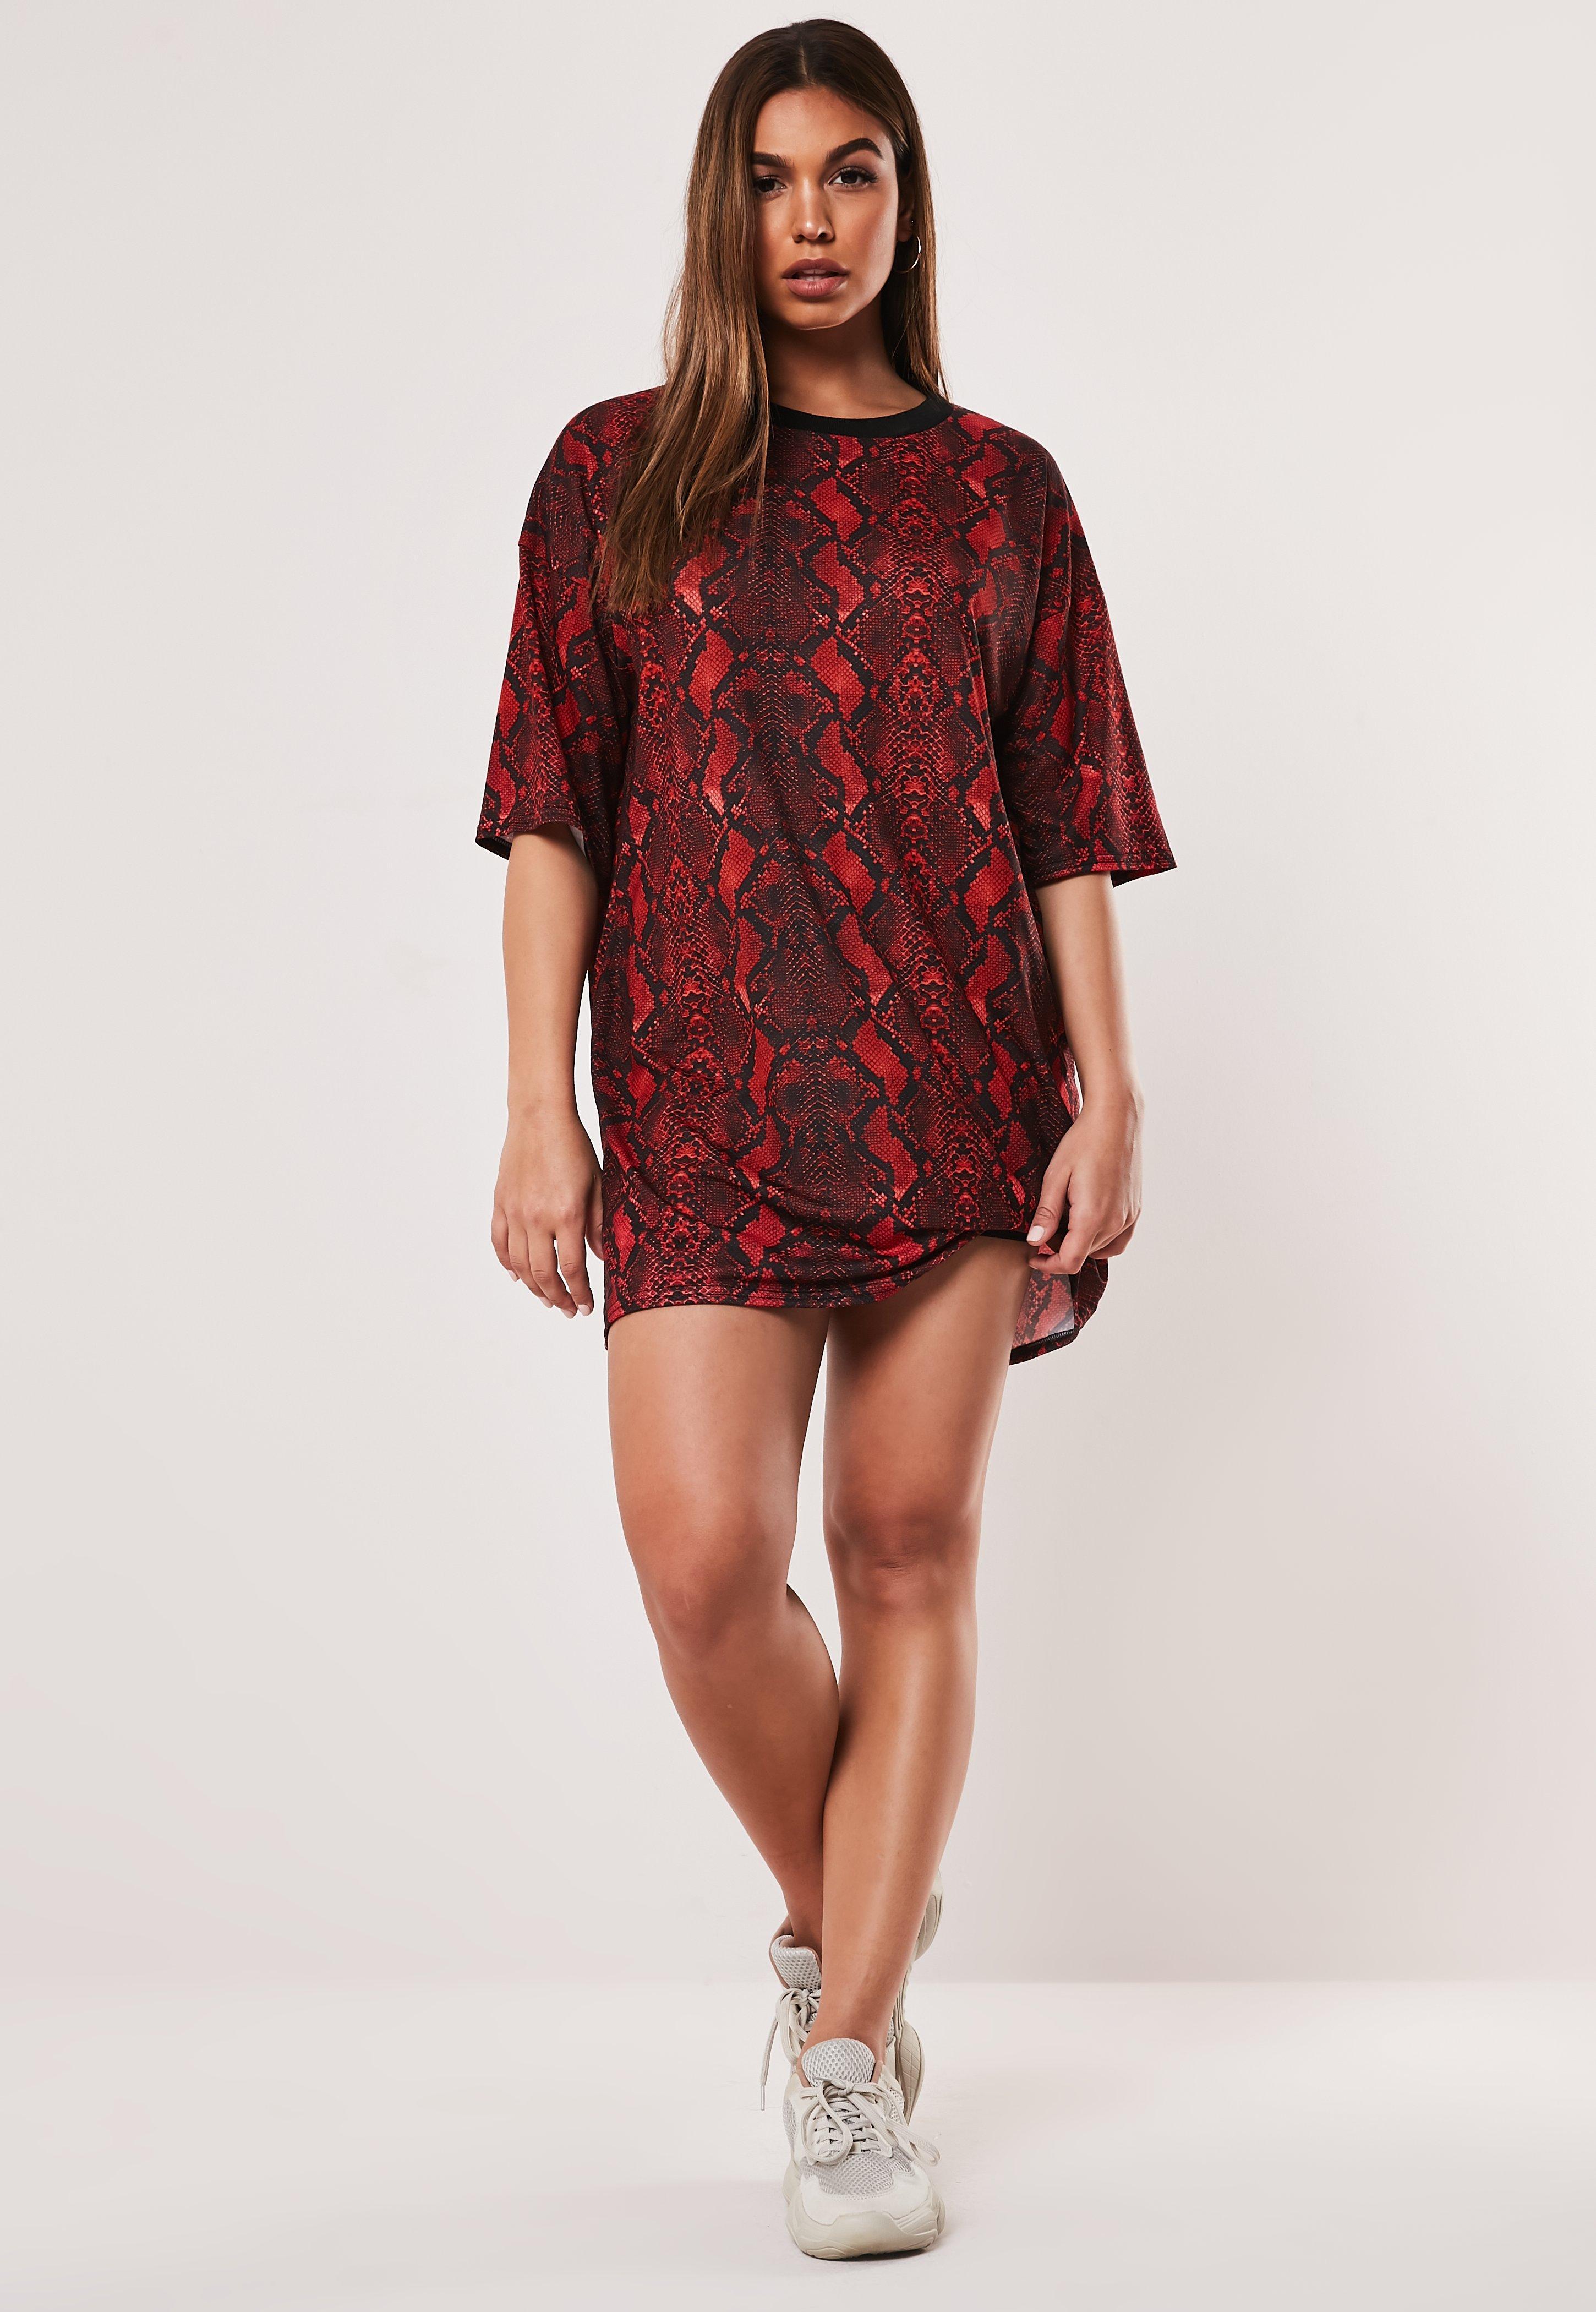 cd831dc6257d Animal Print Clothing | Snake & Leopard Print Dresses - Missguided